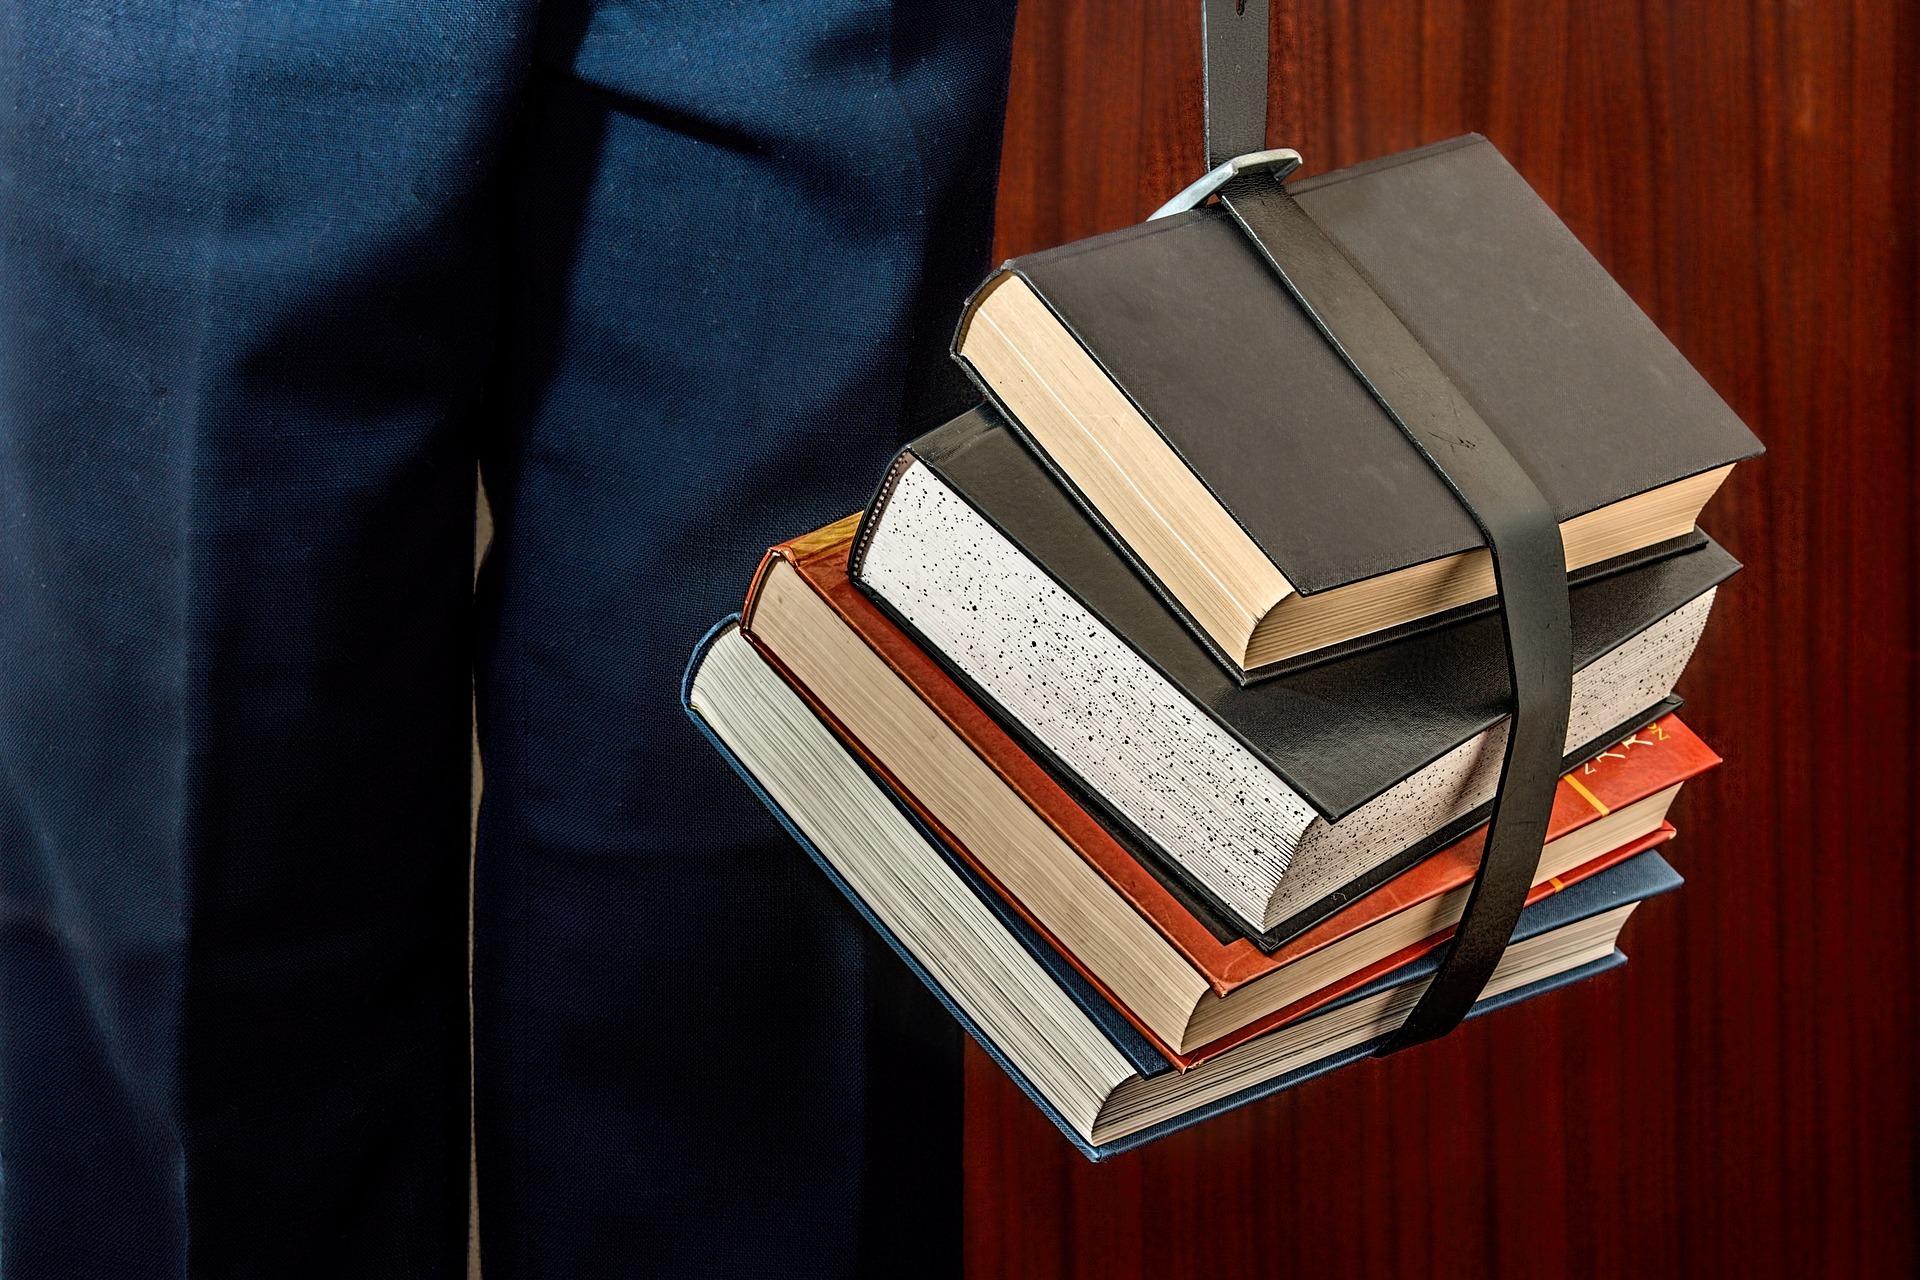 books-1012088_1920 (1)